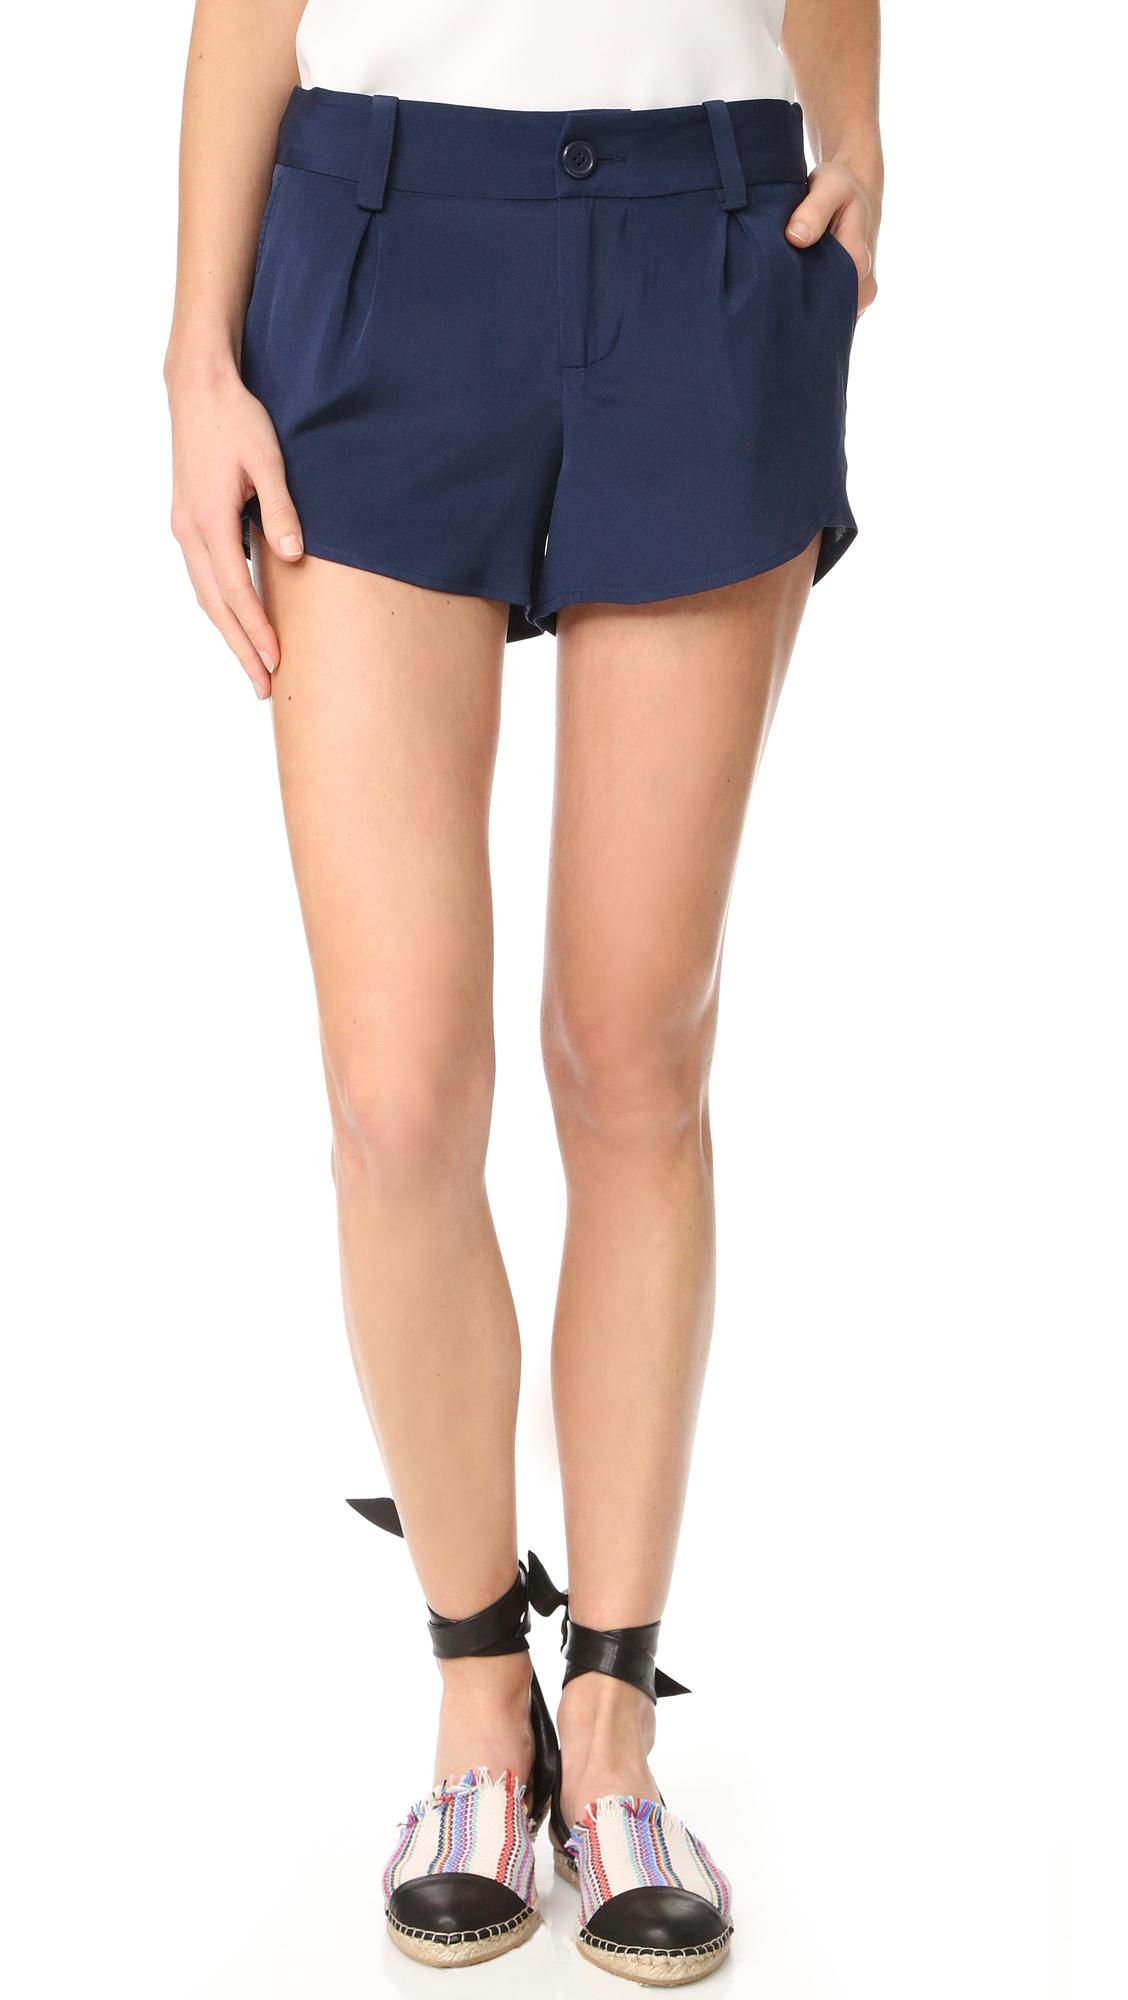 Alice + Olivia Butterfly Shorts - Navy at Shopbop